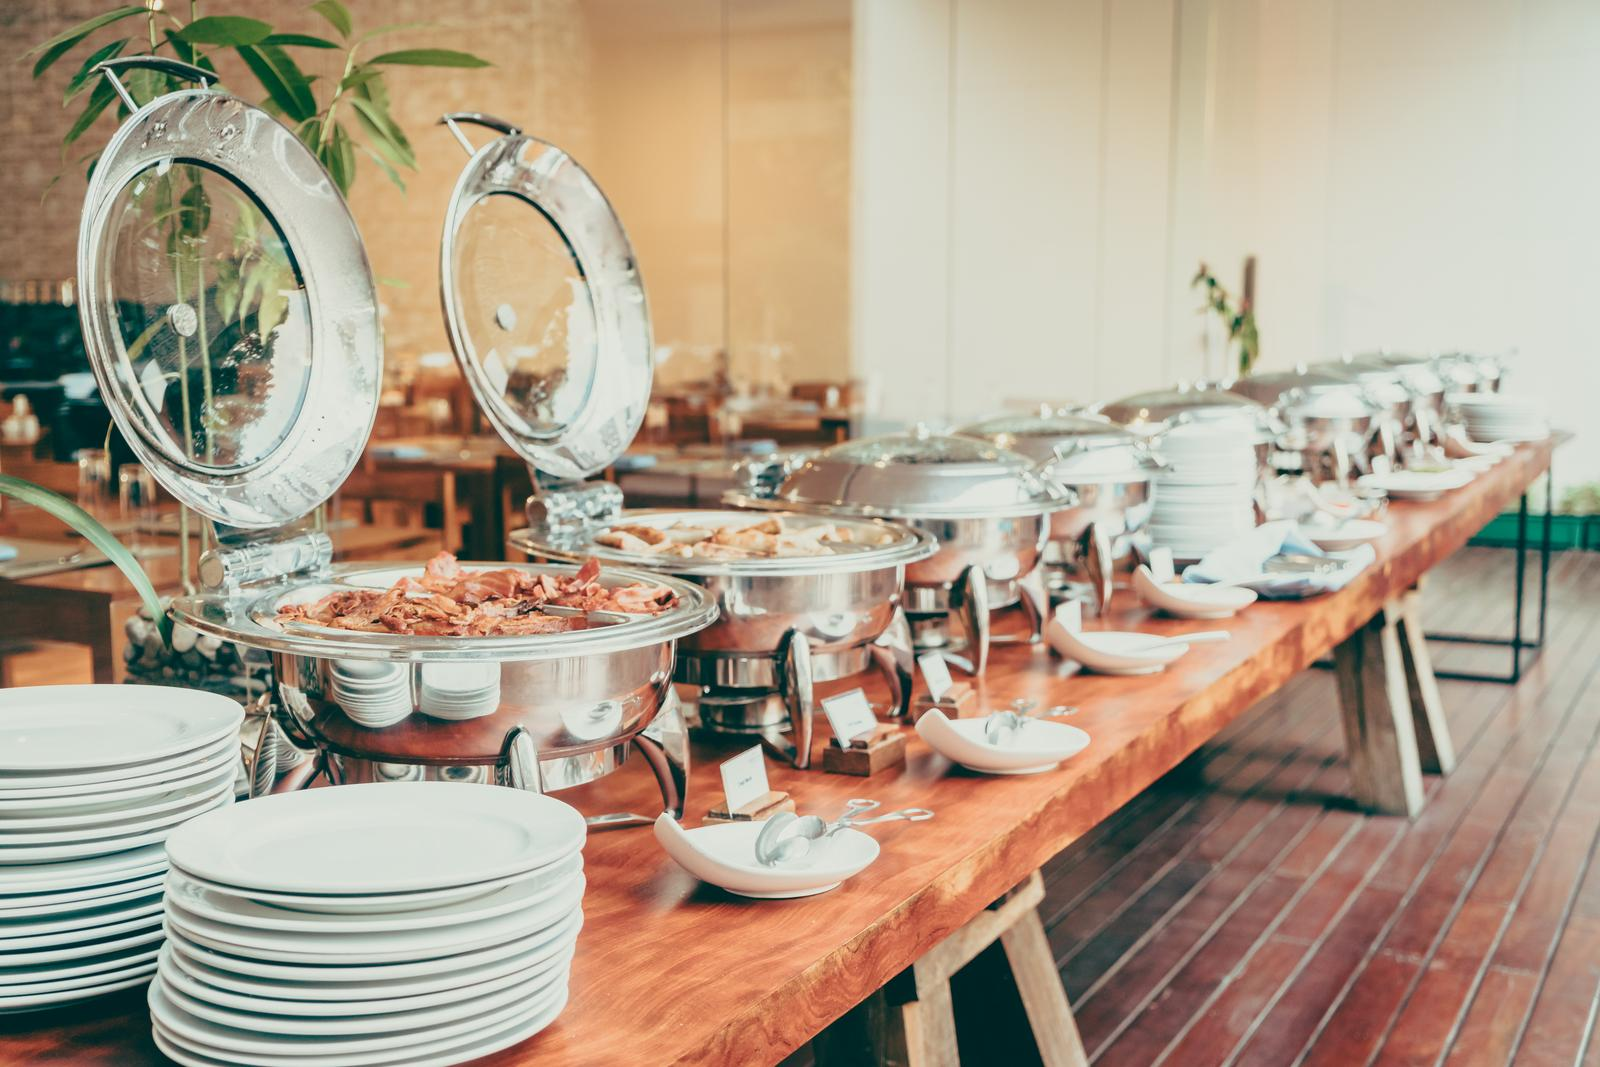 Event catering activities in Tallinn